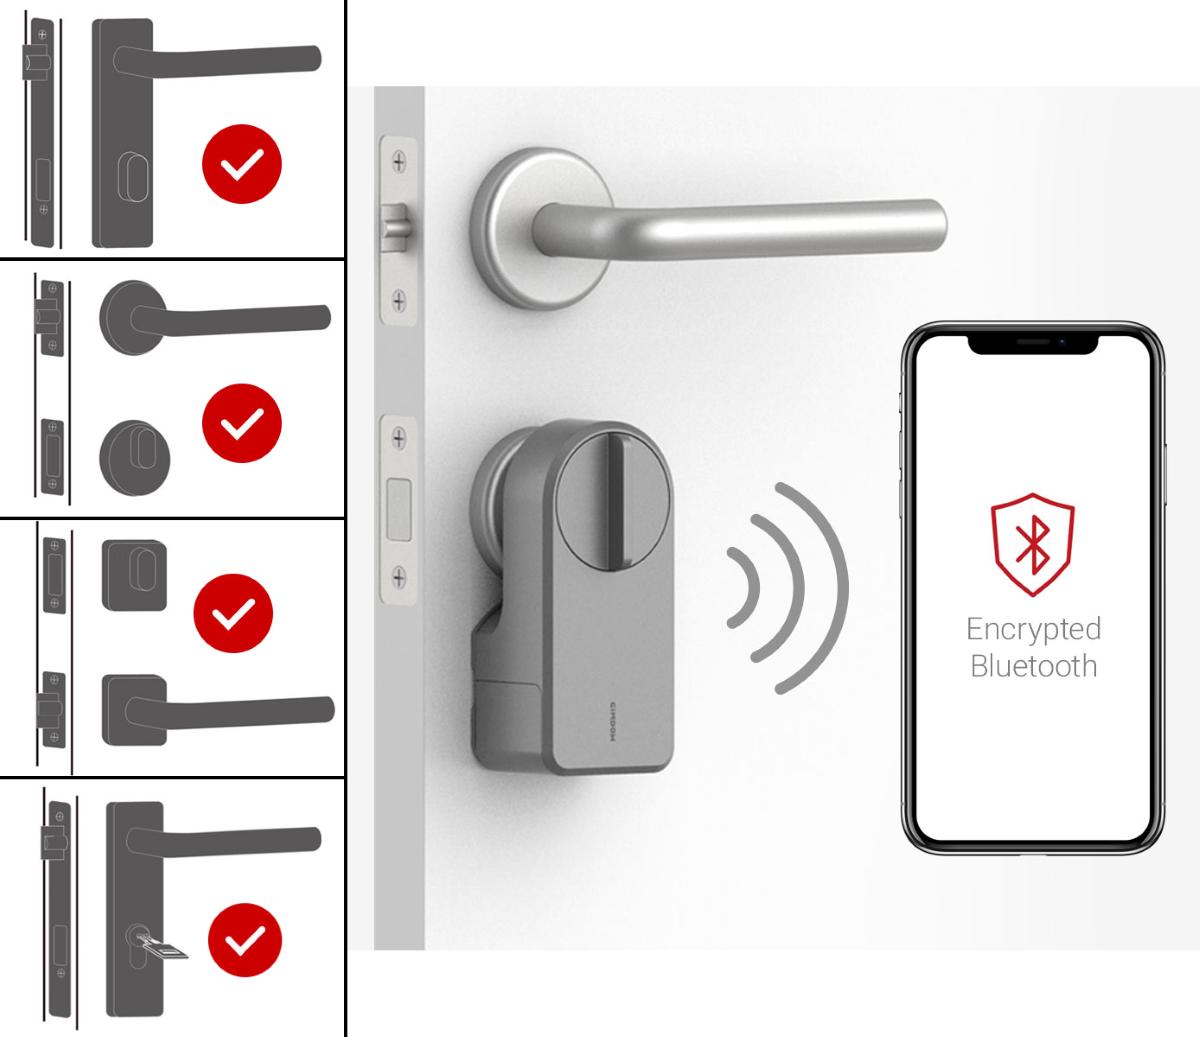 Gimdow Smart Lock - Bluetooth Encryption & Lock Compatibility